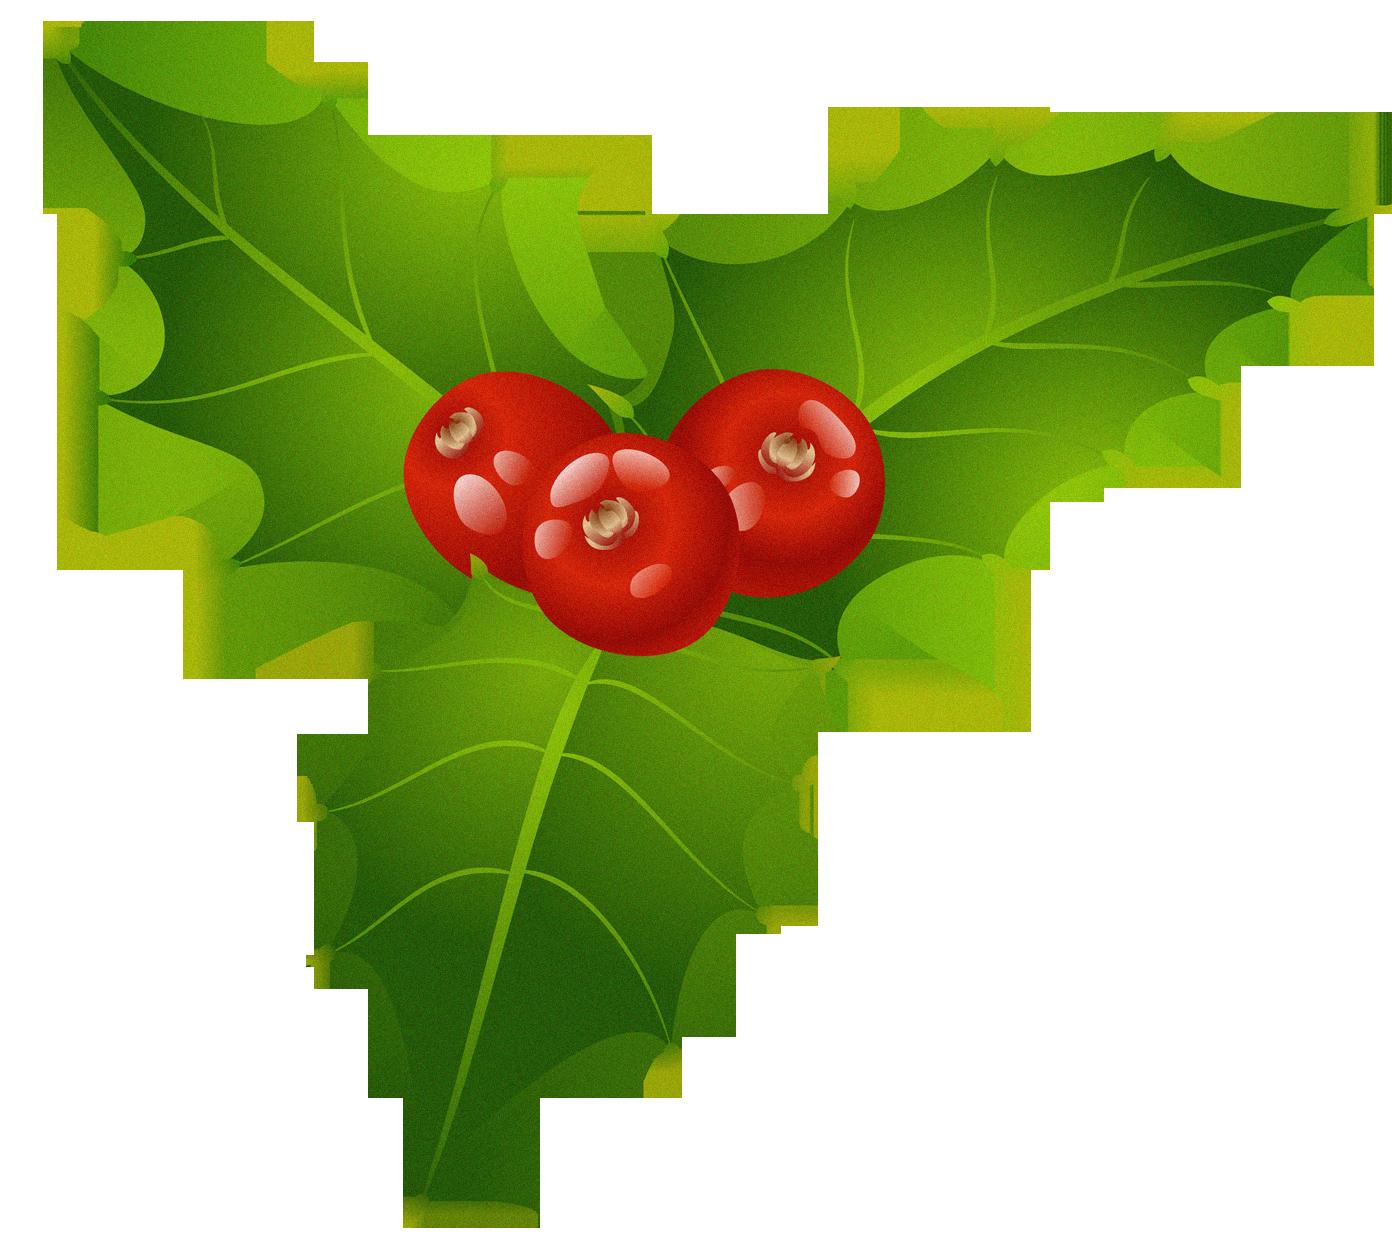 Christmas Mistletoe Png Clipart Christmas Clipart Free Christmas Wallpaper Free Christmas Clipart